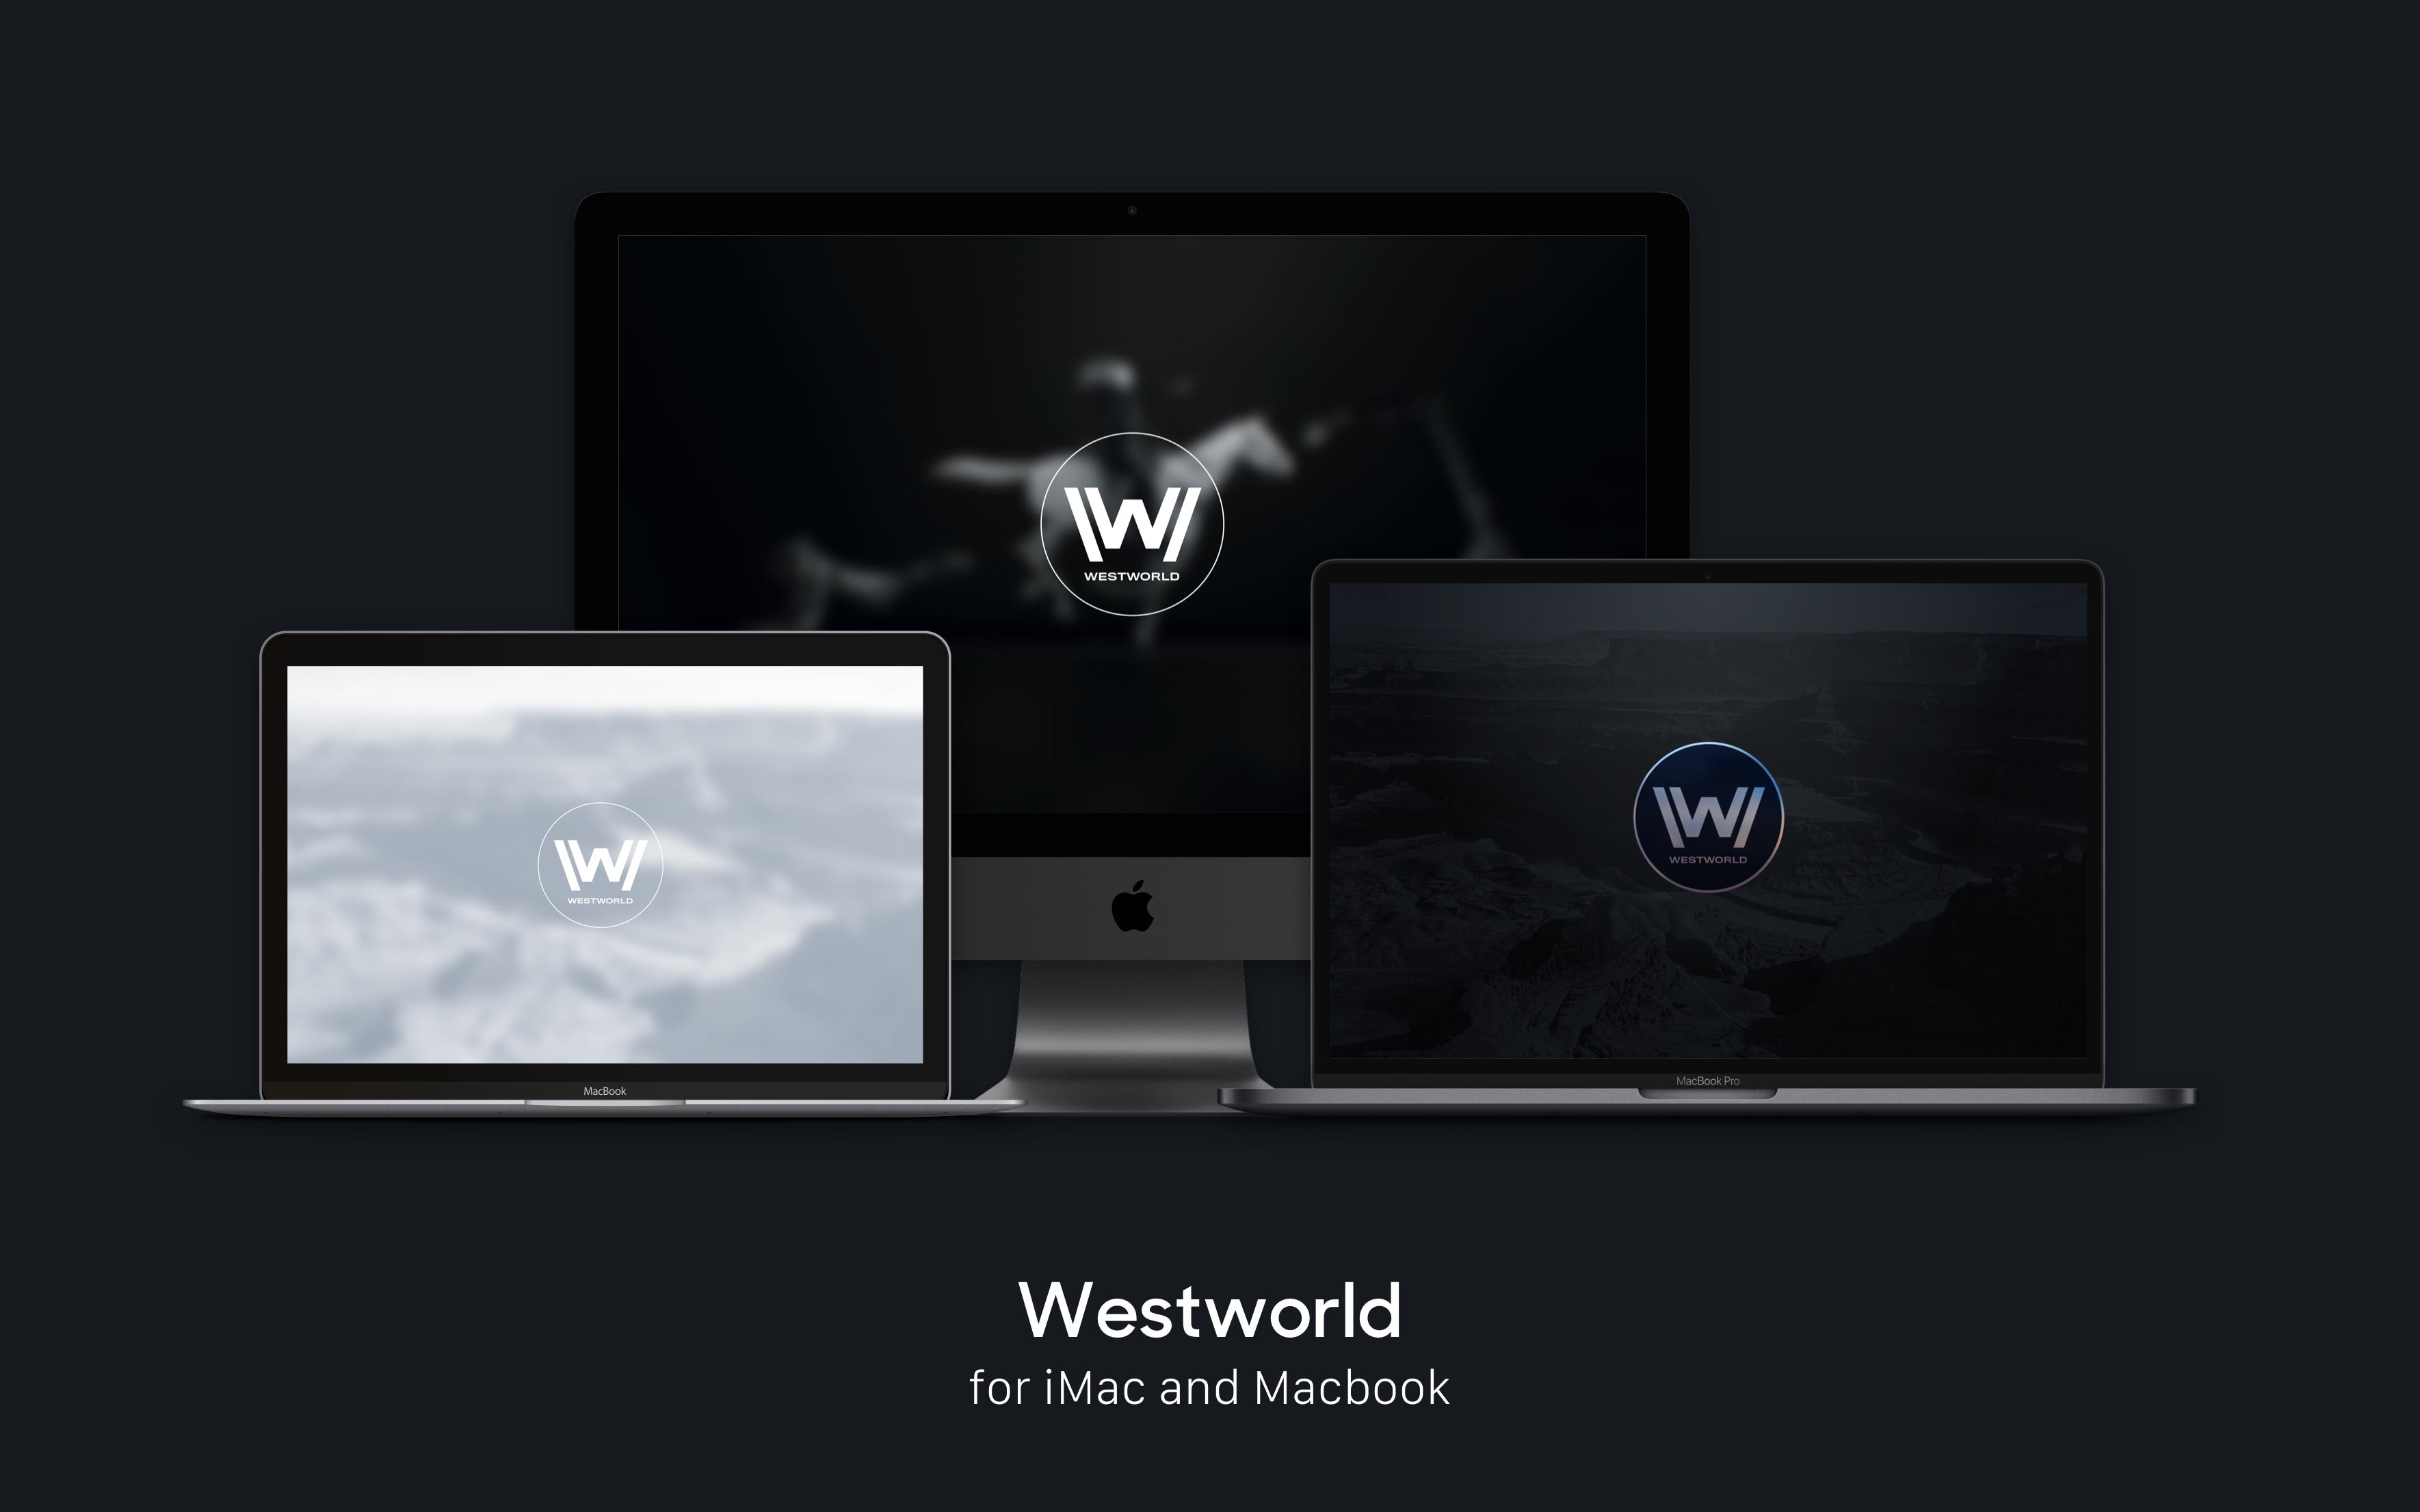 Westworld Wallpapers By Octaviotti On Deviantart